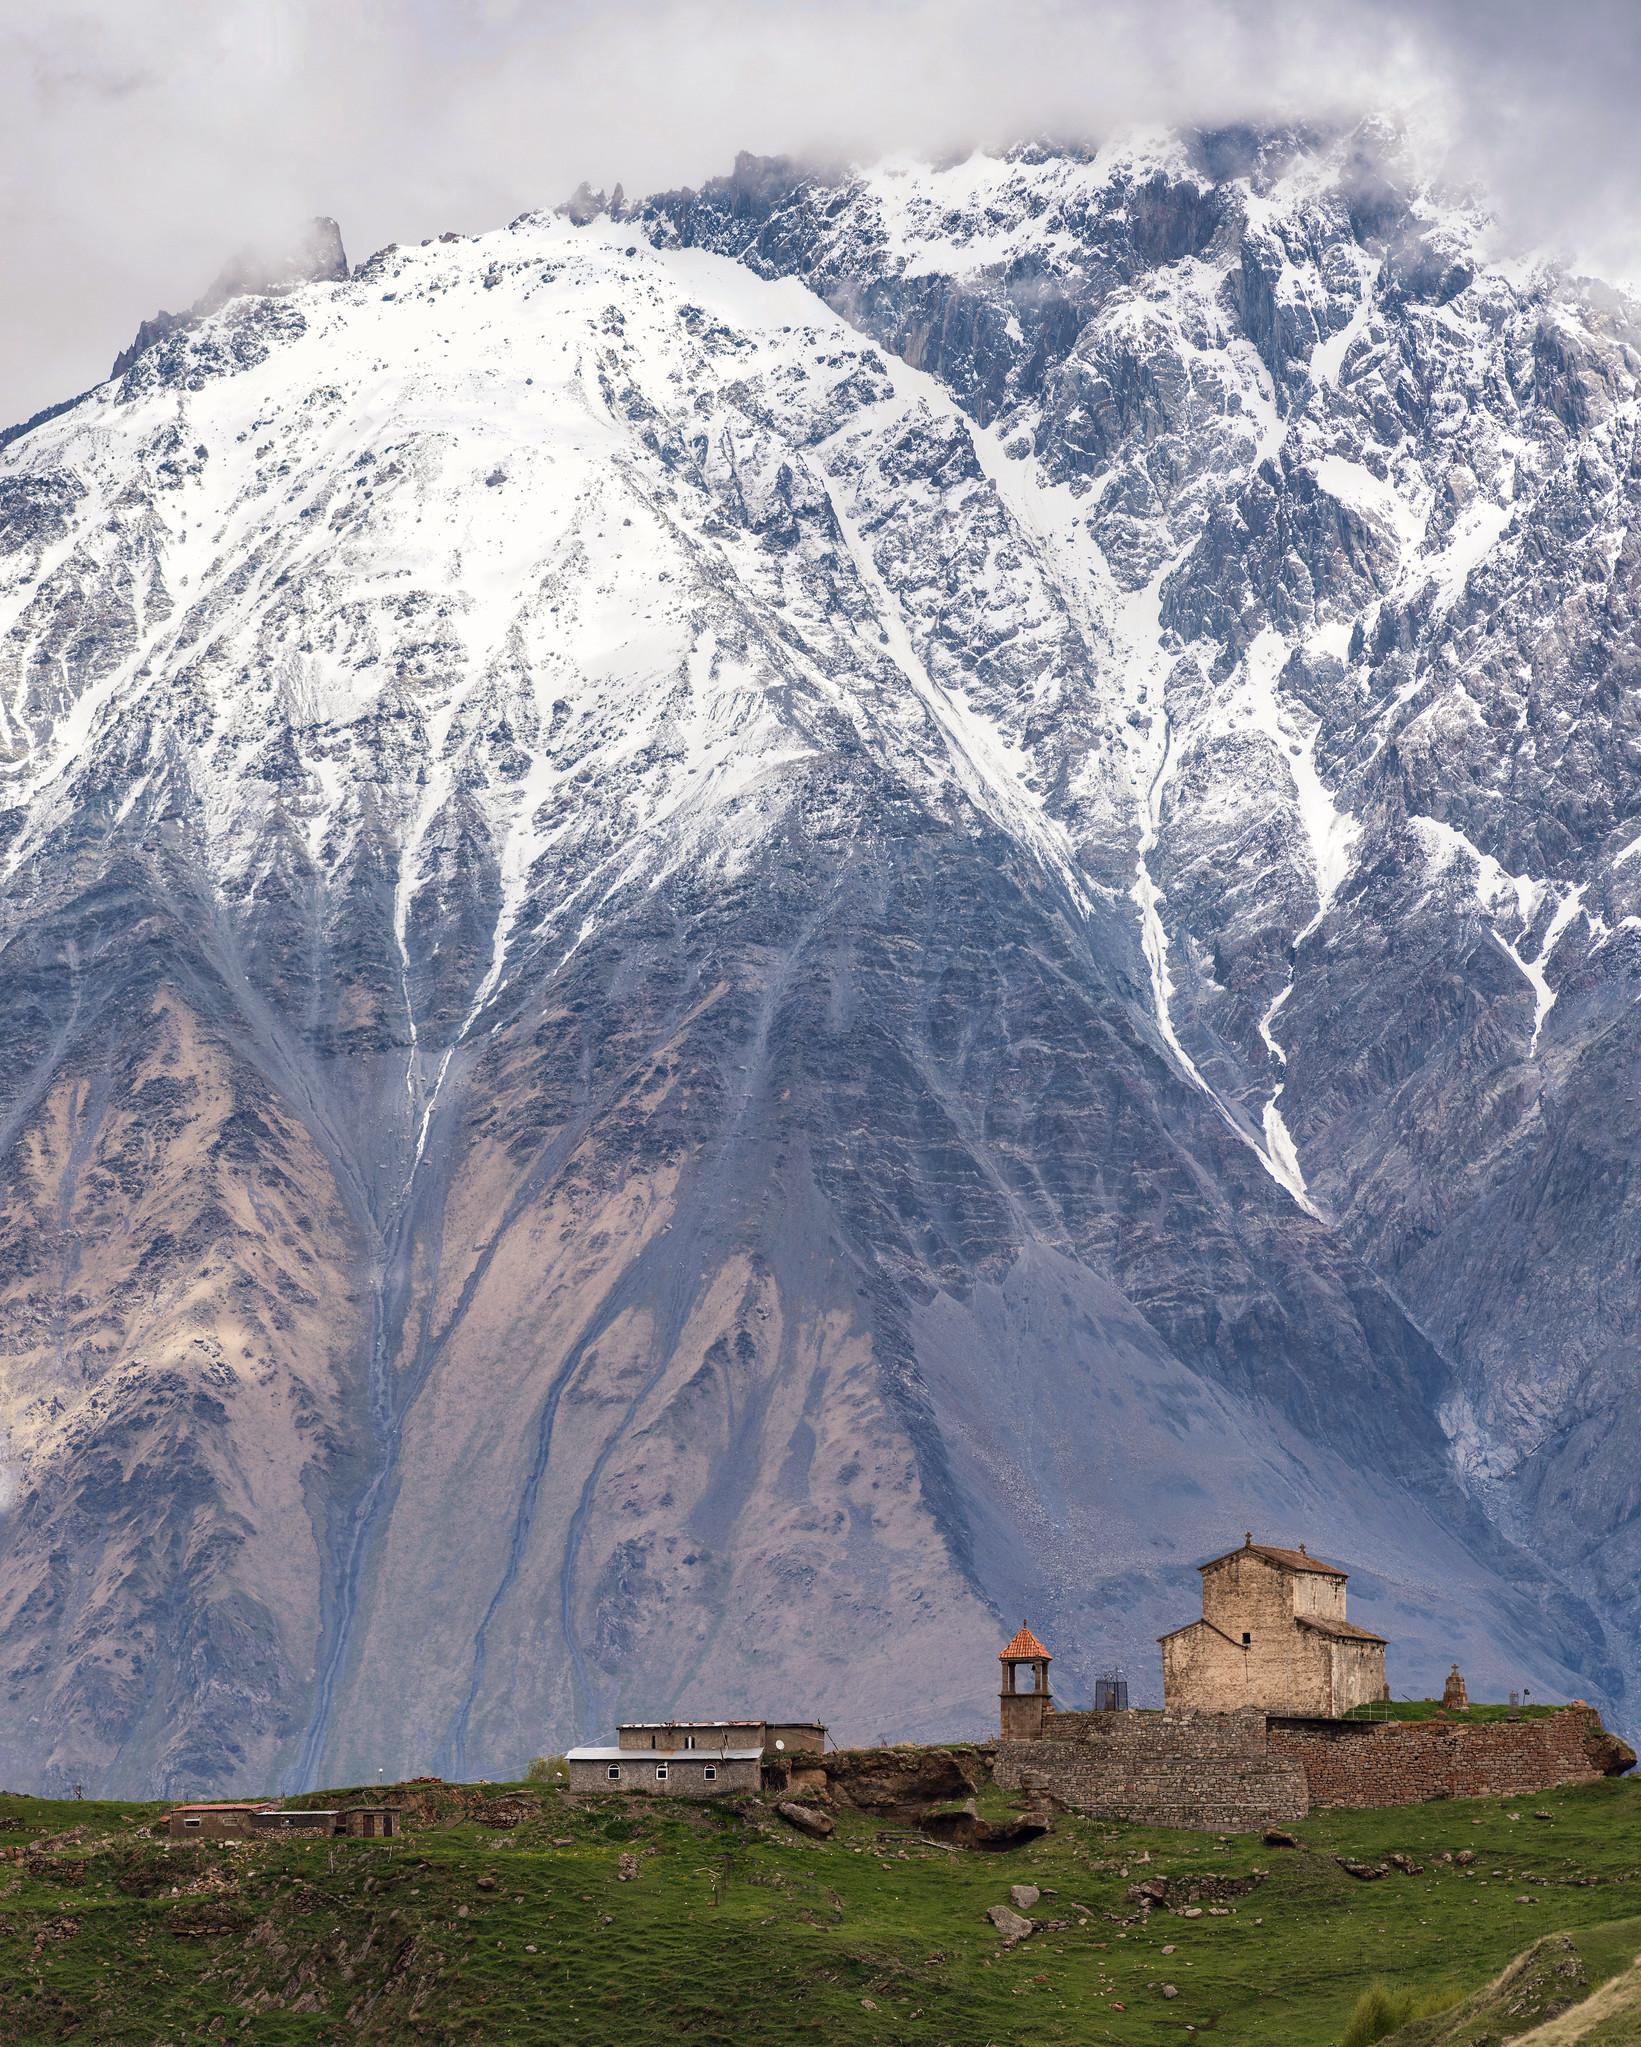 Caucasus Monastery